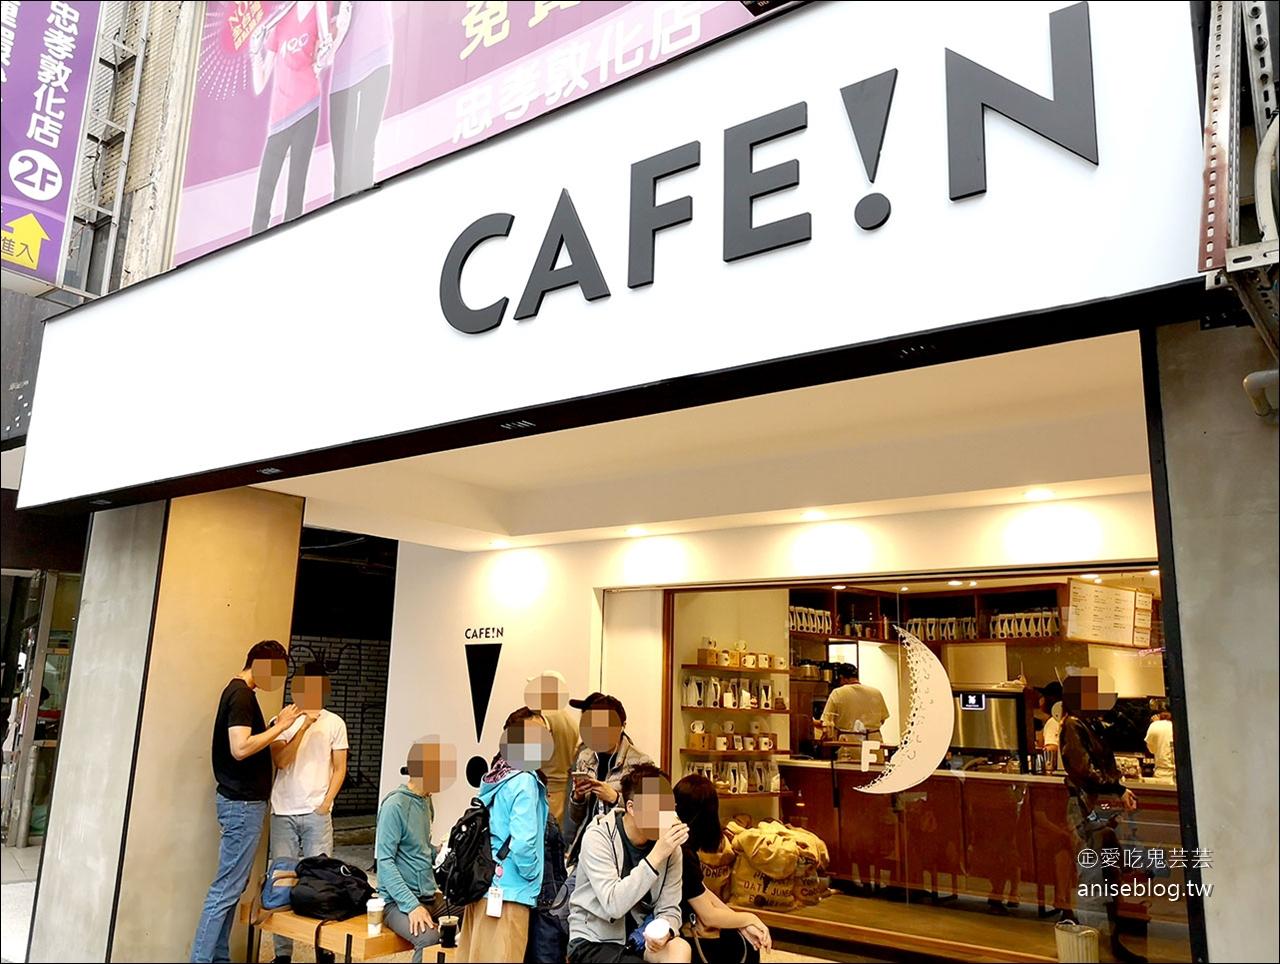 CAFE!N,東區最新IG打卡點 冠軍咖啡x冠軍麵包x設計大師